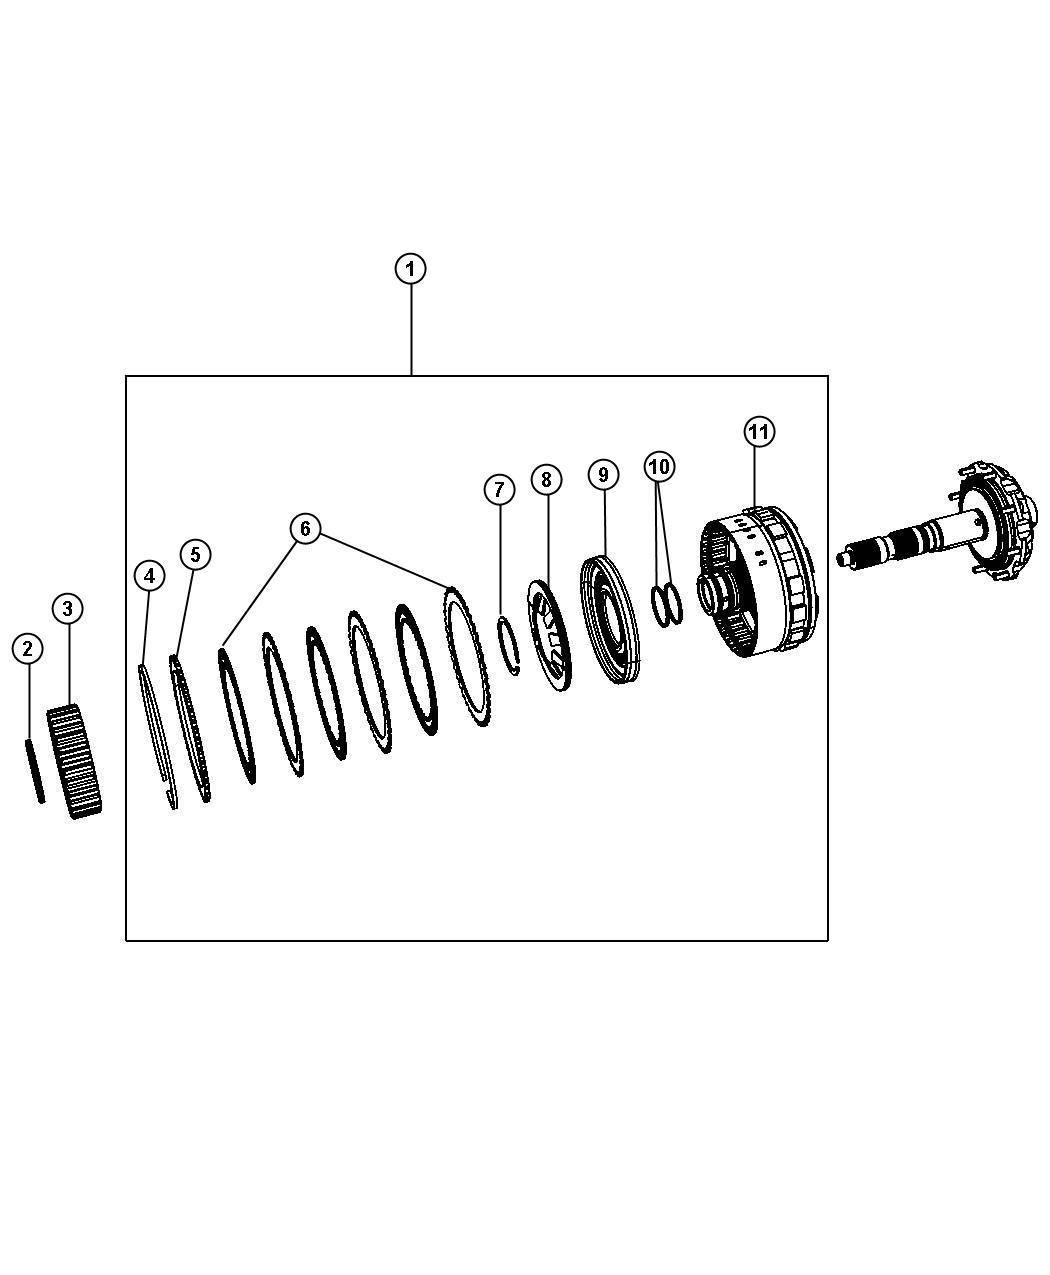 Chrysler Sebring Clutch assembly. Overrunning clutch. Gear